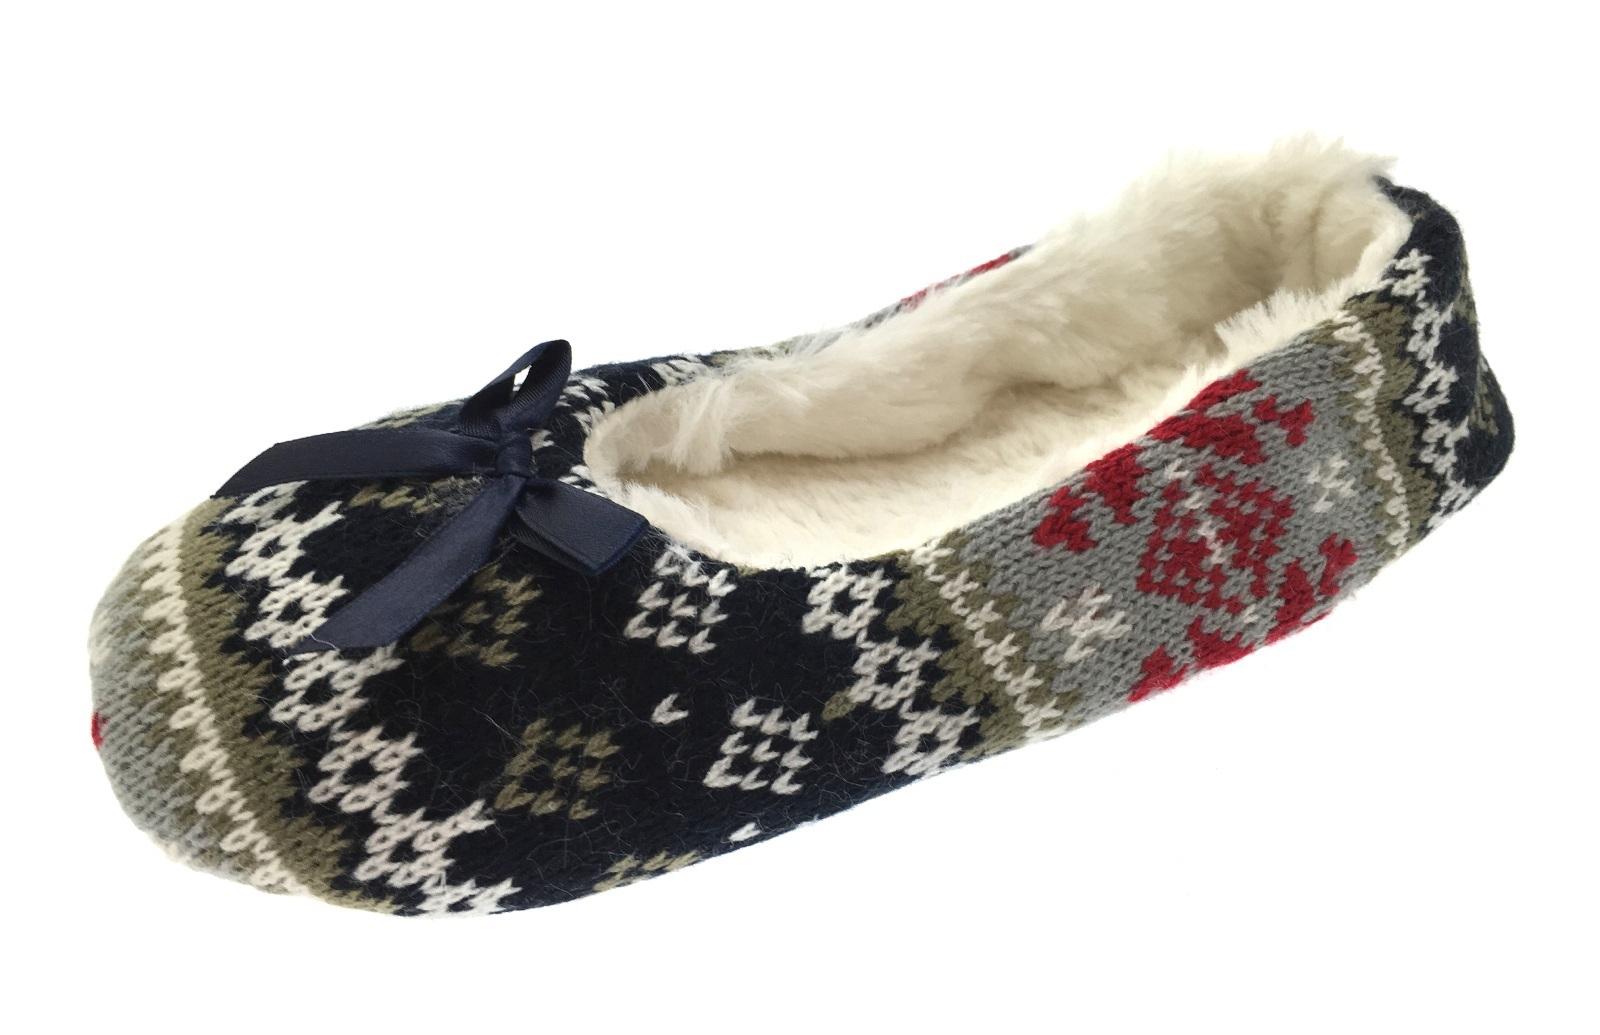 Para Mujer Zapatillas Pug Bear Arco mulas Chicas Damas de punto Ballet Bombas tamaño del Reino Unido 3-8